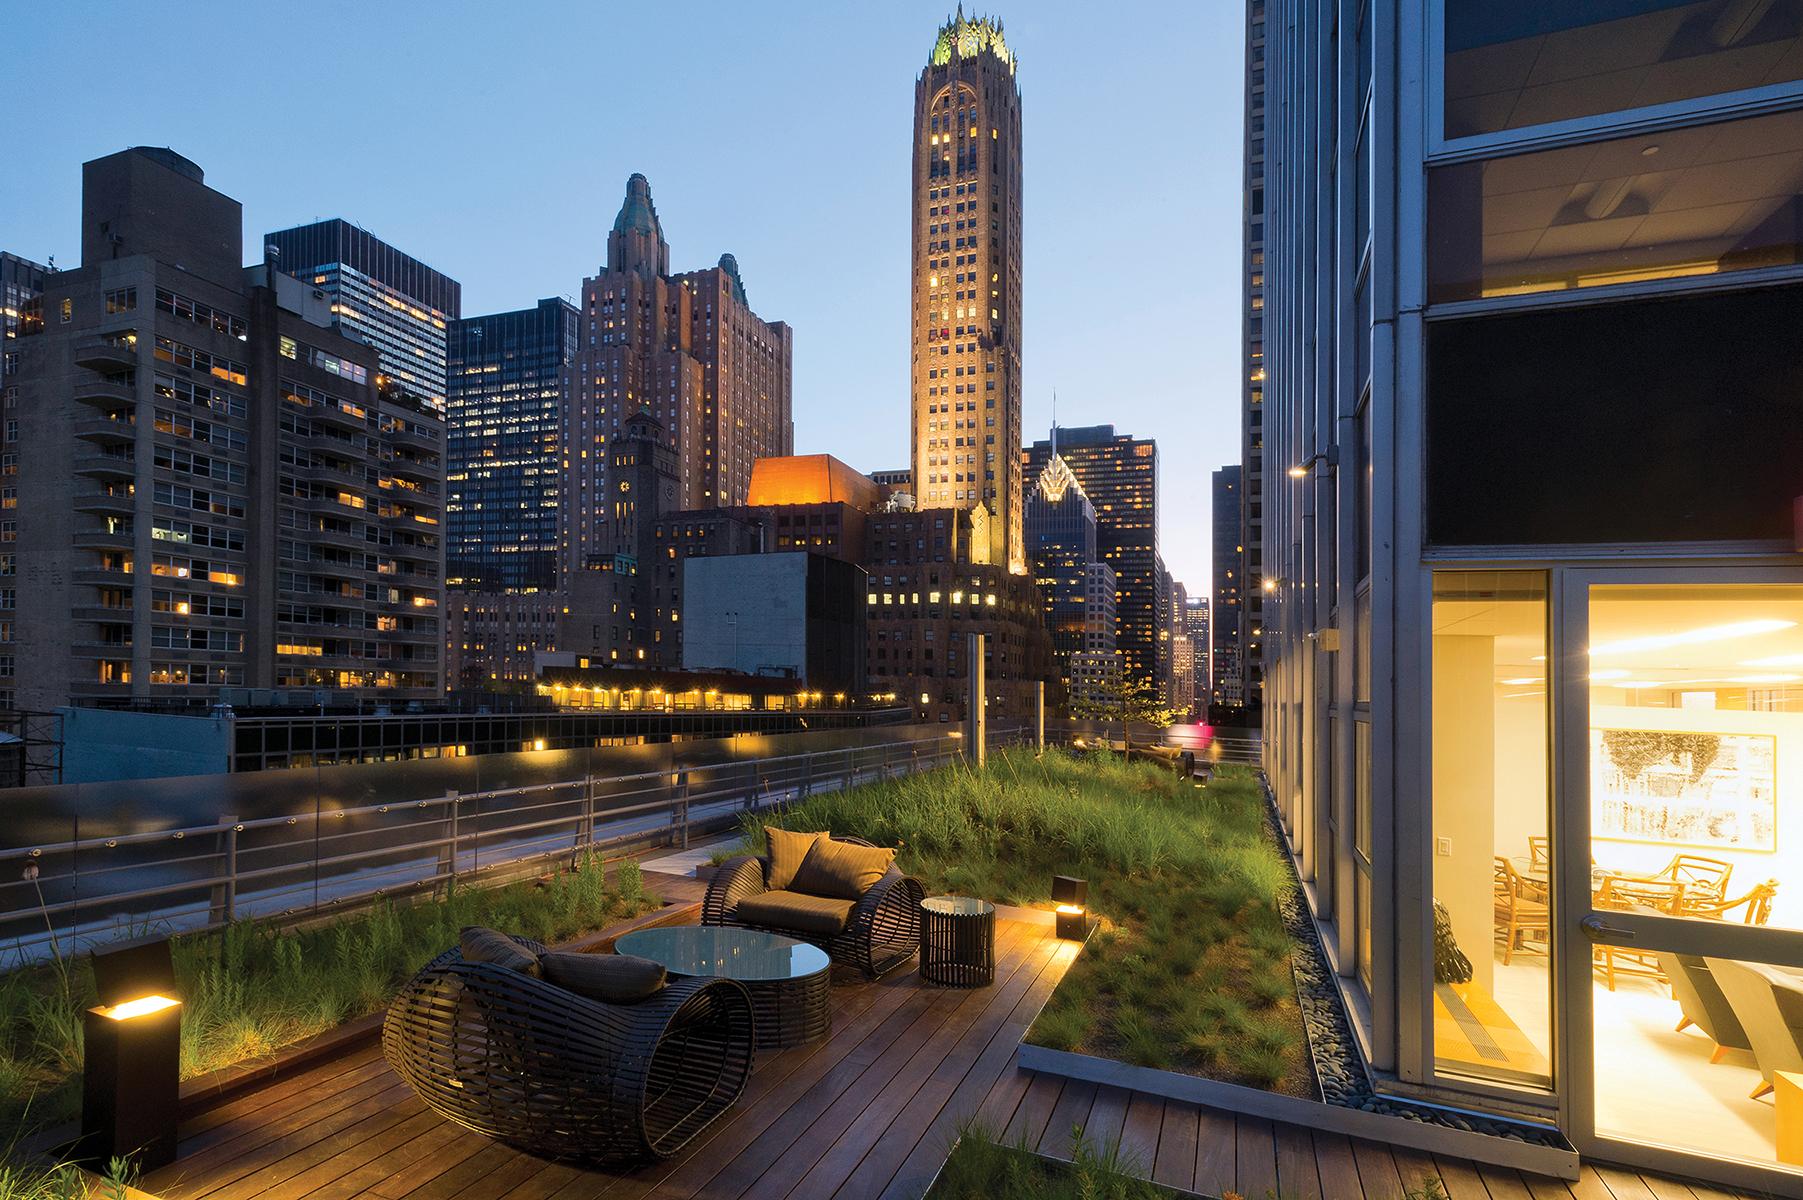 Vegetative Roof Waterproofing For Long Term Performance